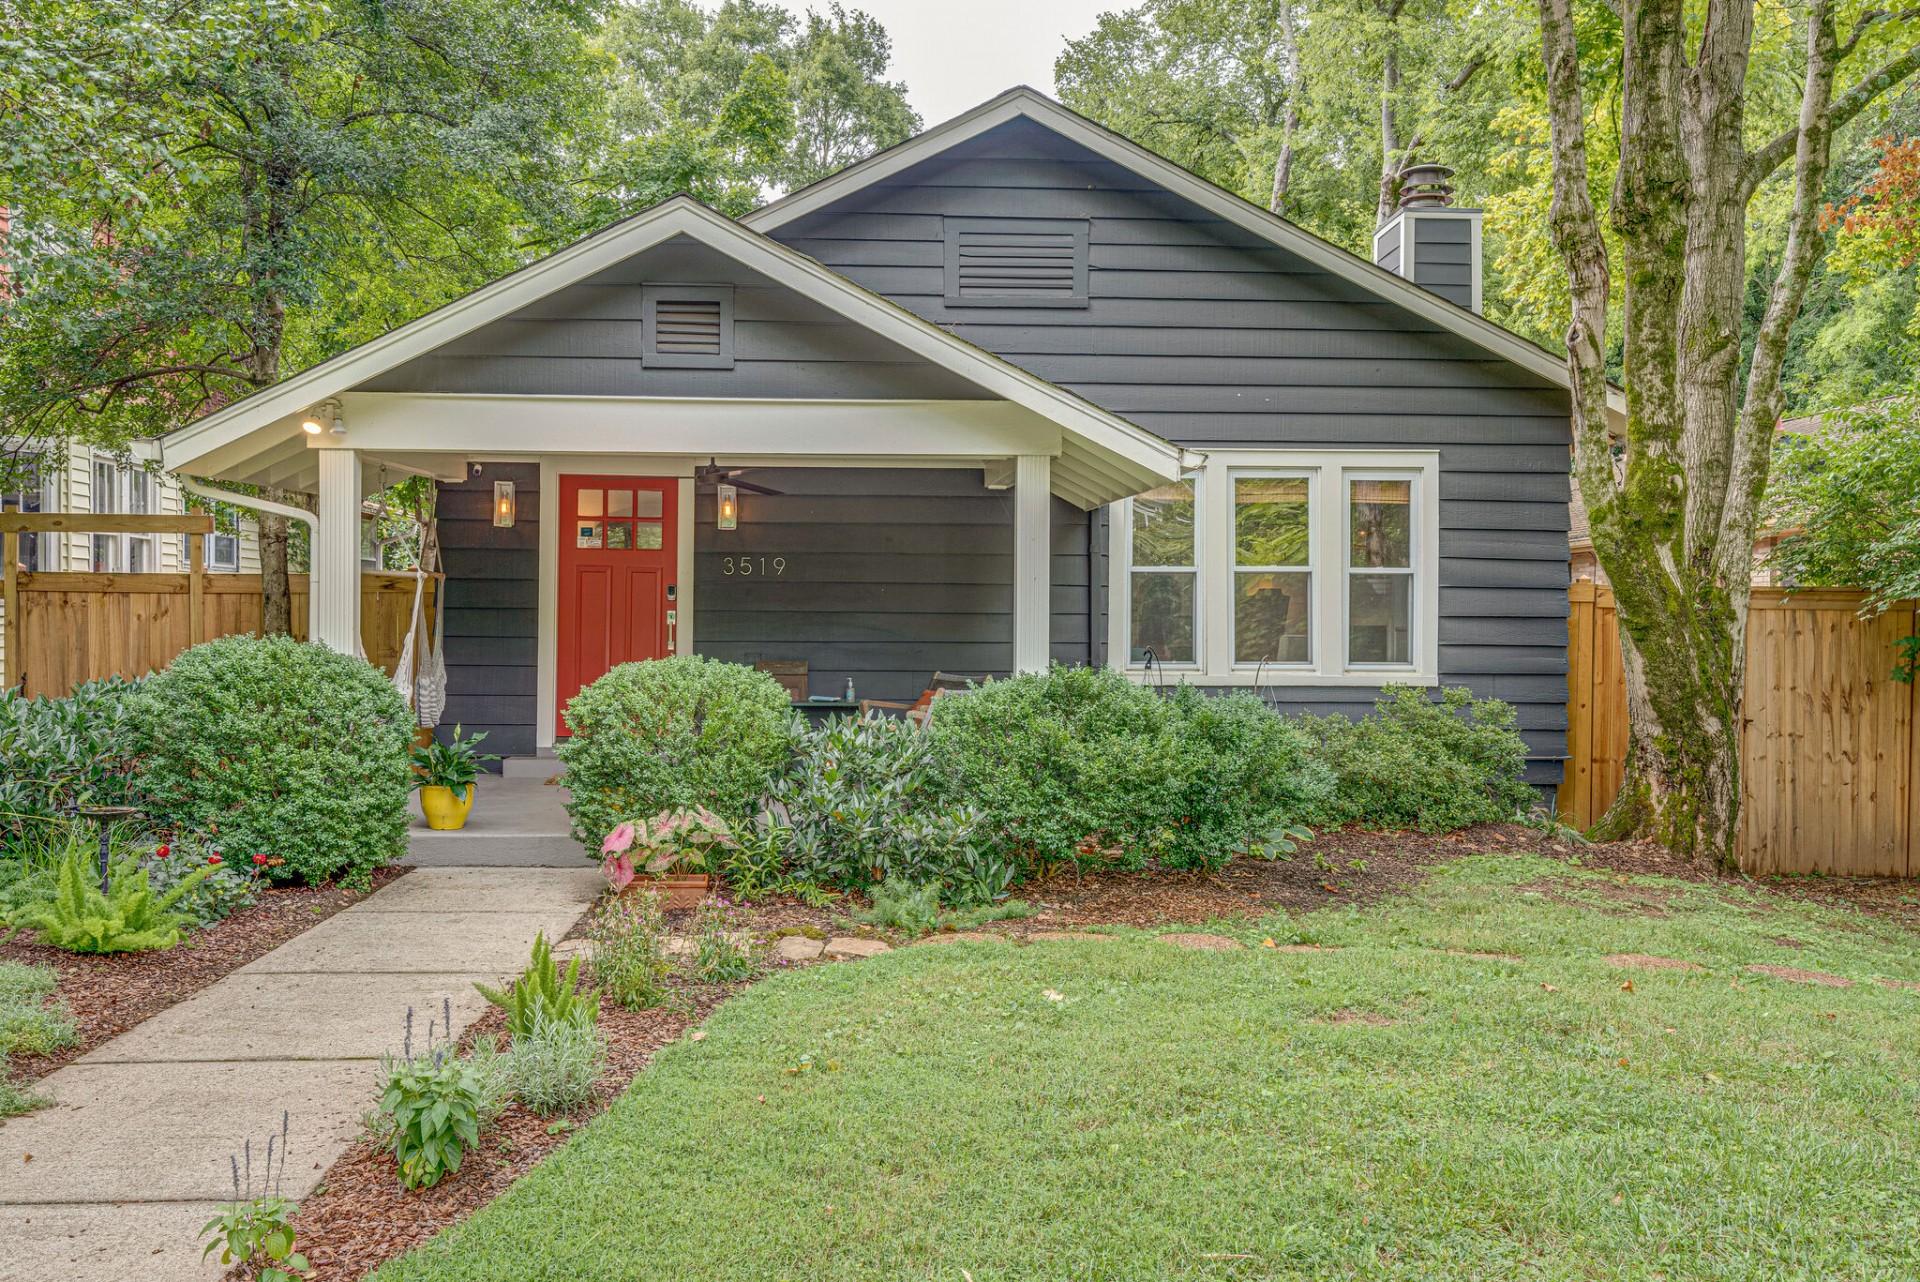 3519 Central Ave Property Photo - Nashville, TN real estate listing